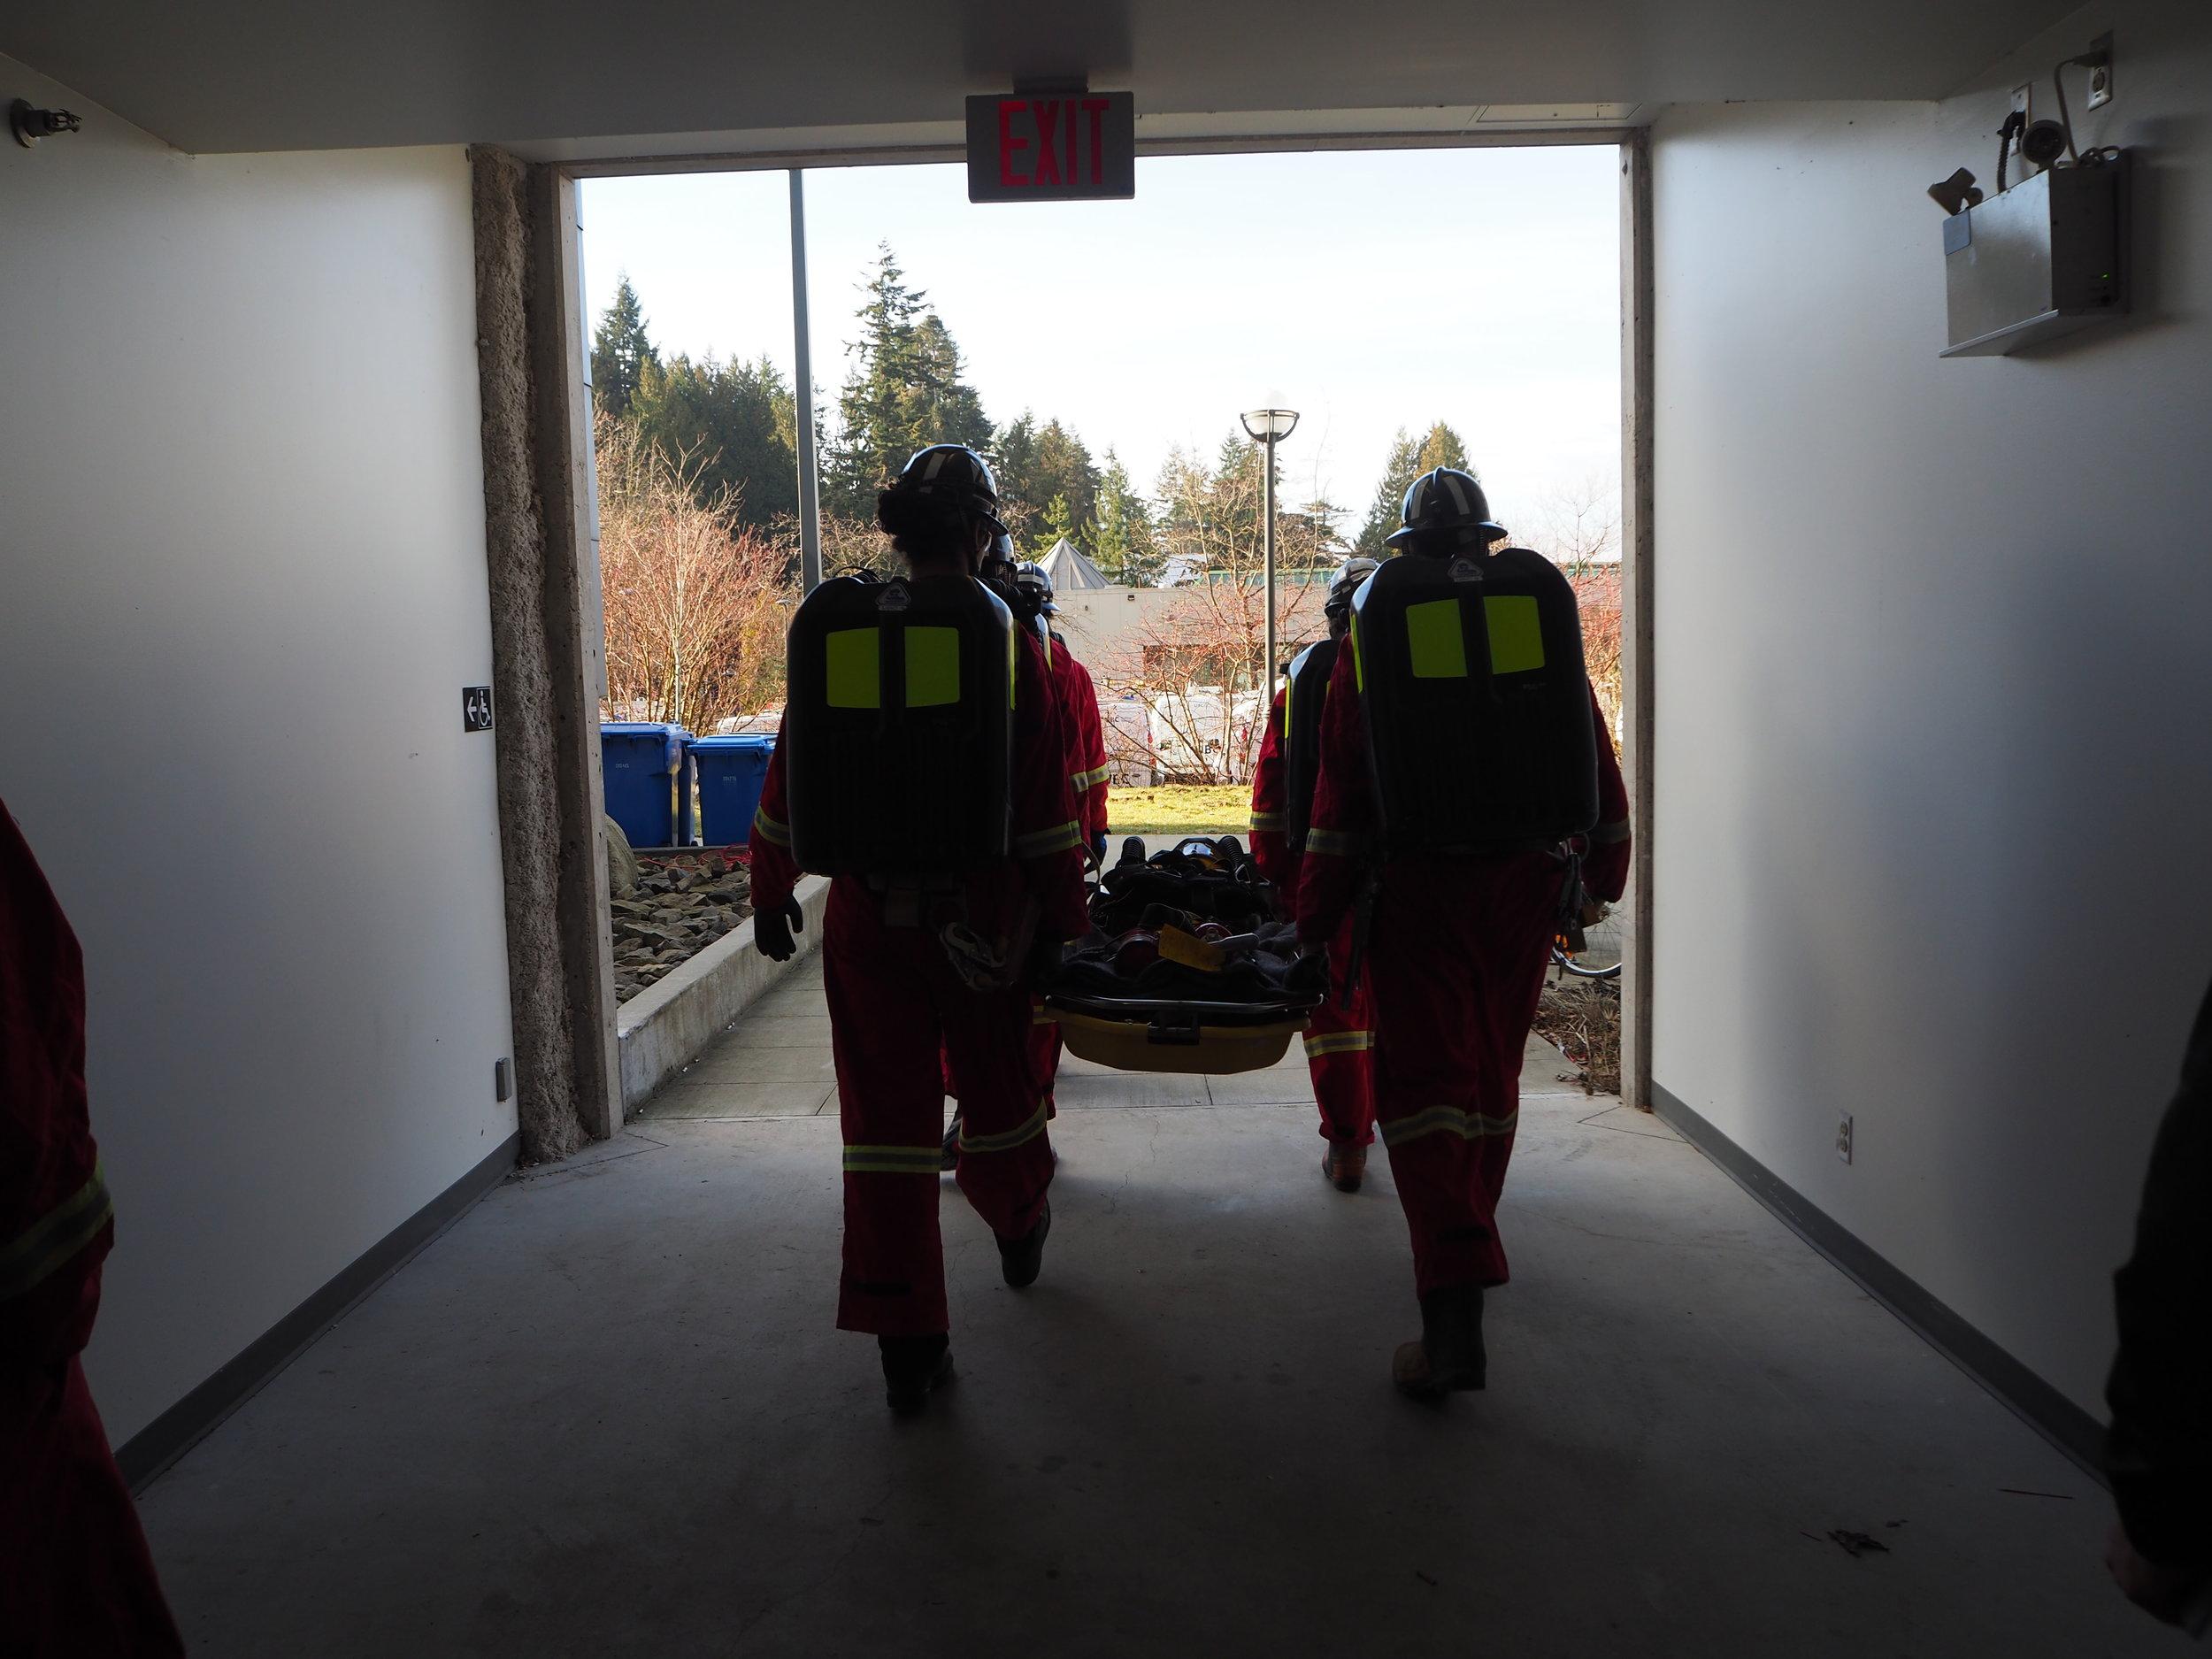 UBC Mine Rescue team practicing at the University of British Columbia